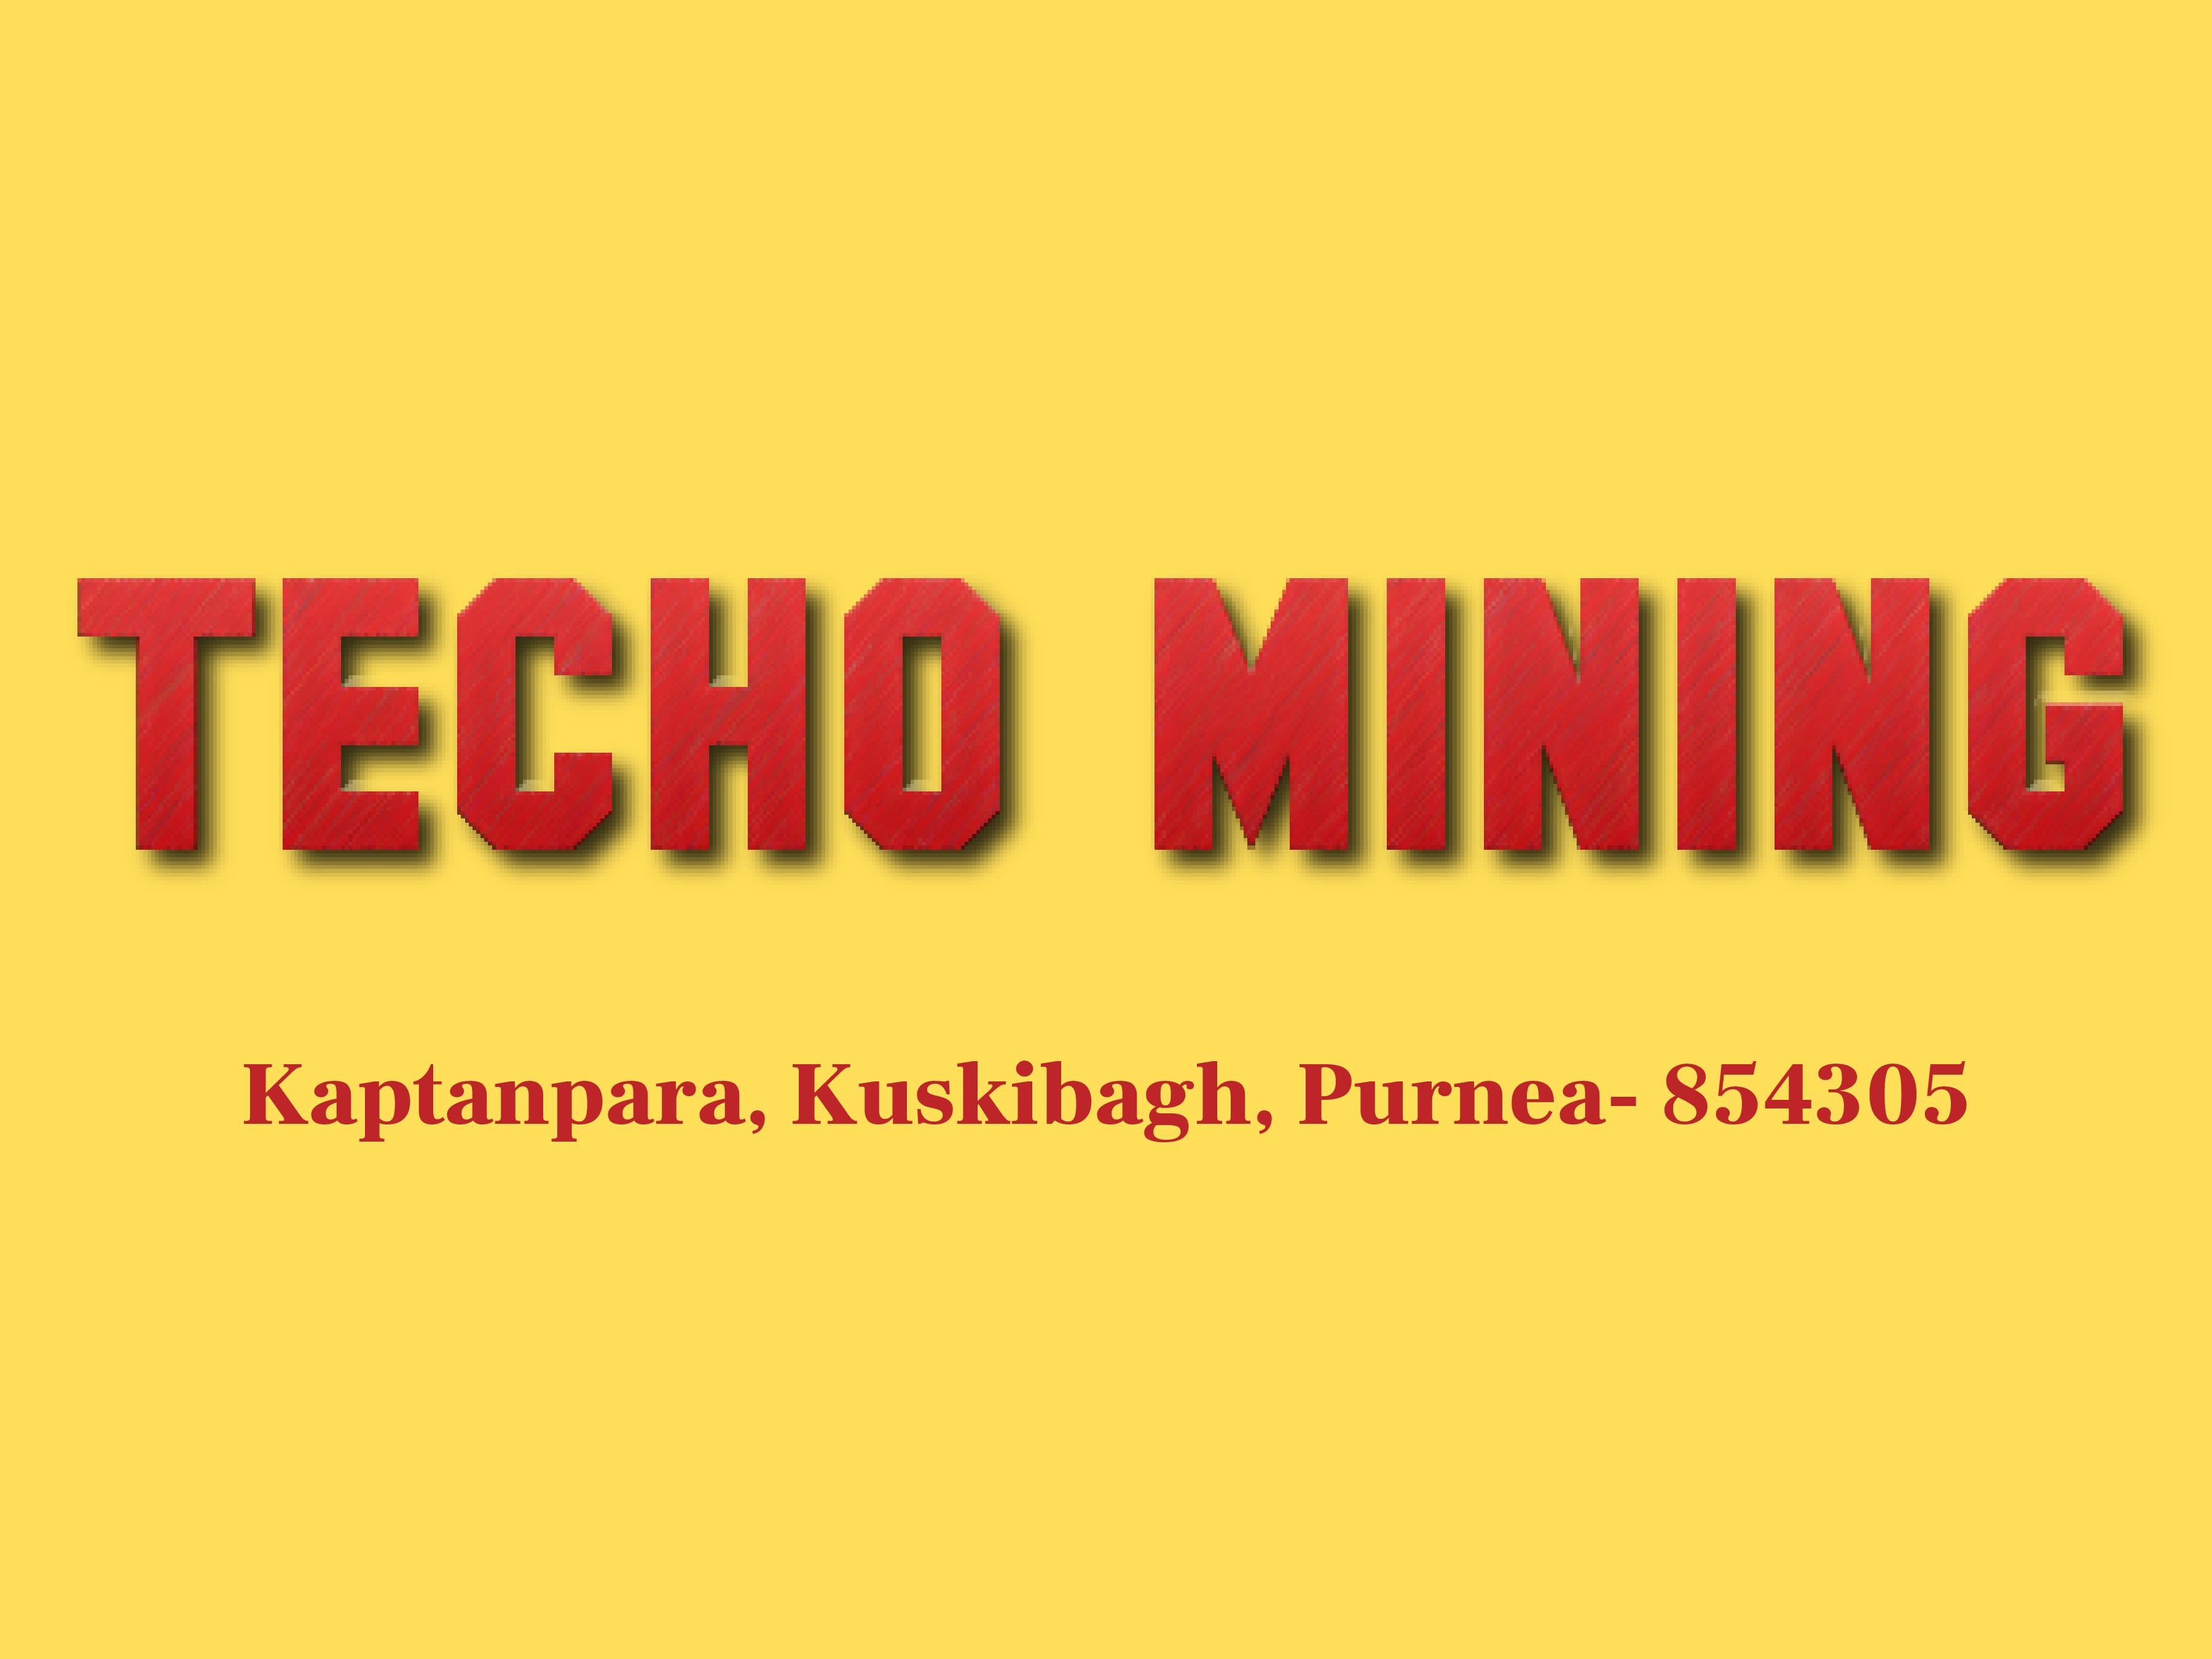 TechoMining Software Company